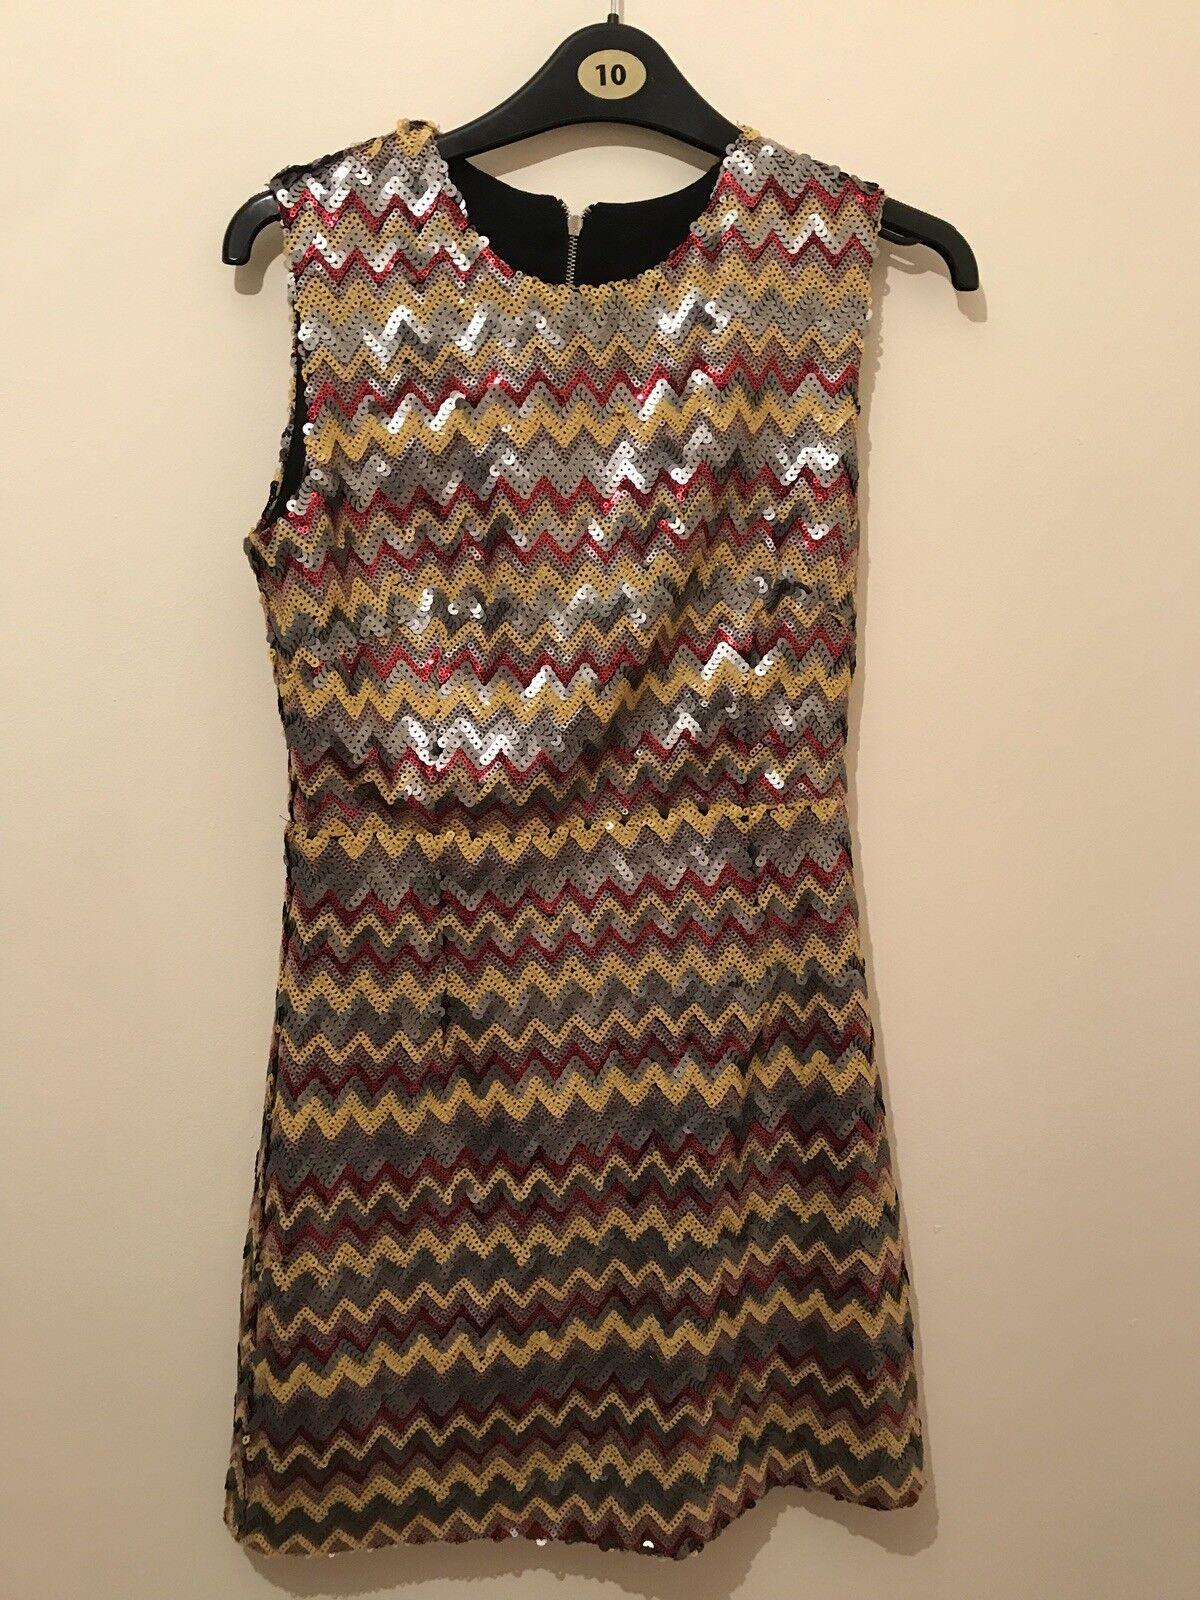 Topshop stunning sequin chevron dress. Size 8 . Designer Jovonna London .